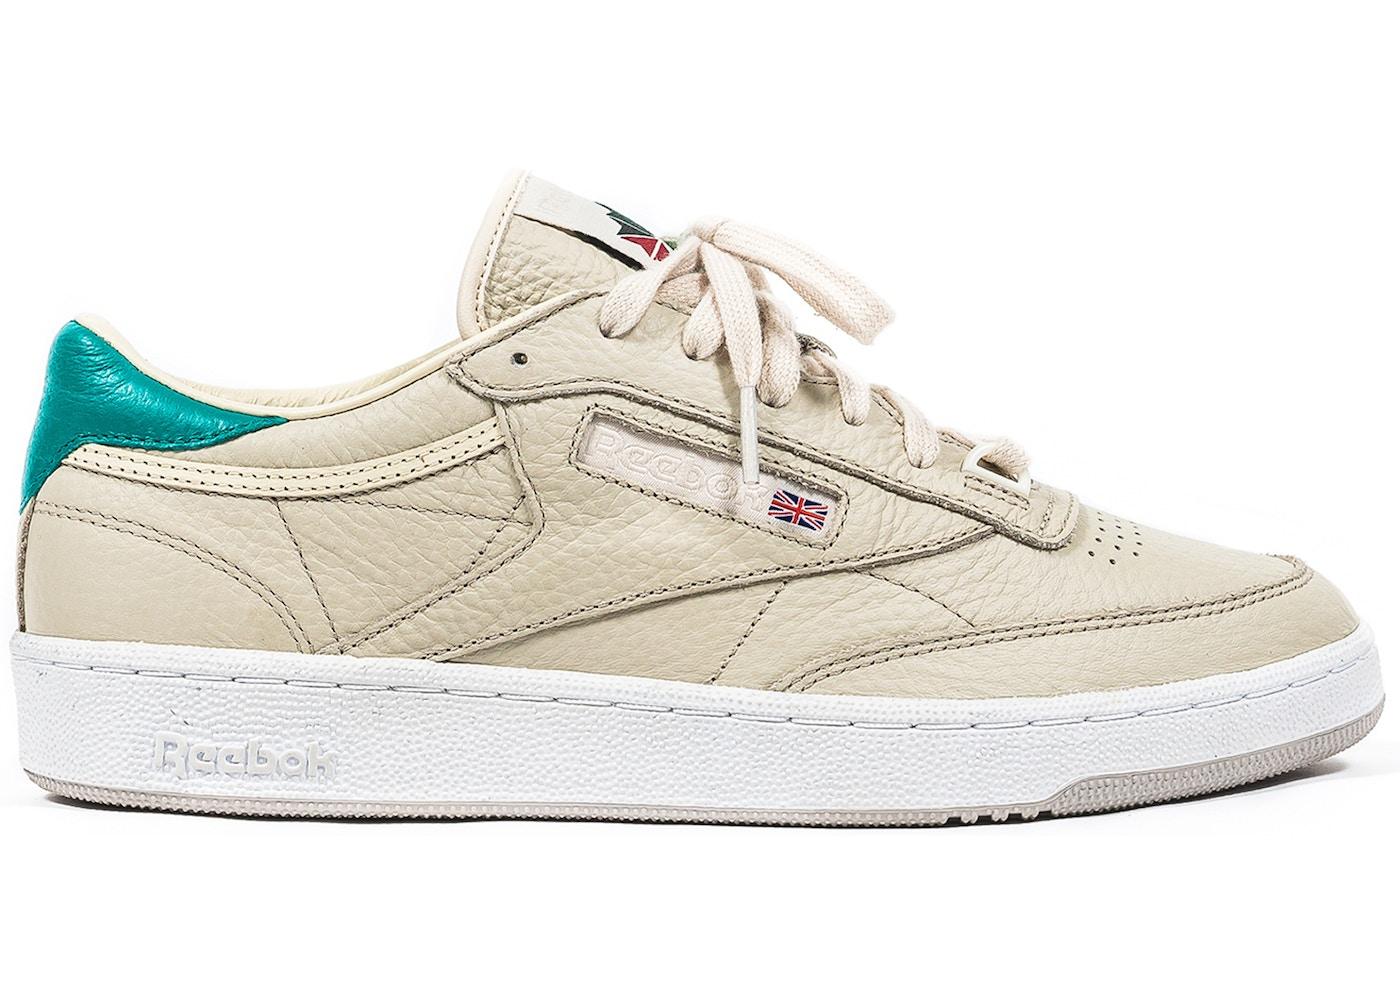 Reebok Club C Packer Shoes Marcial